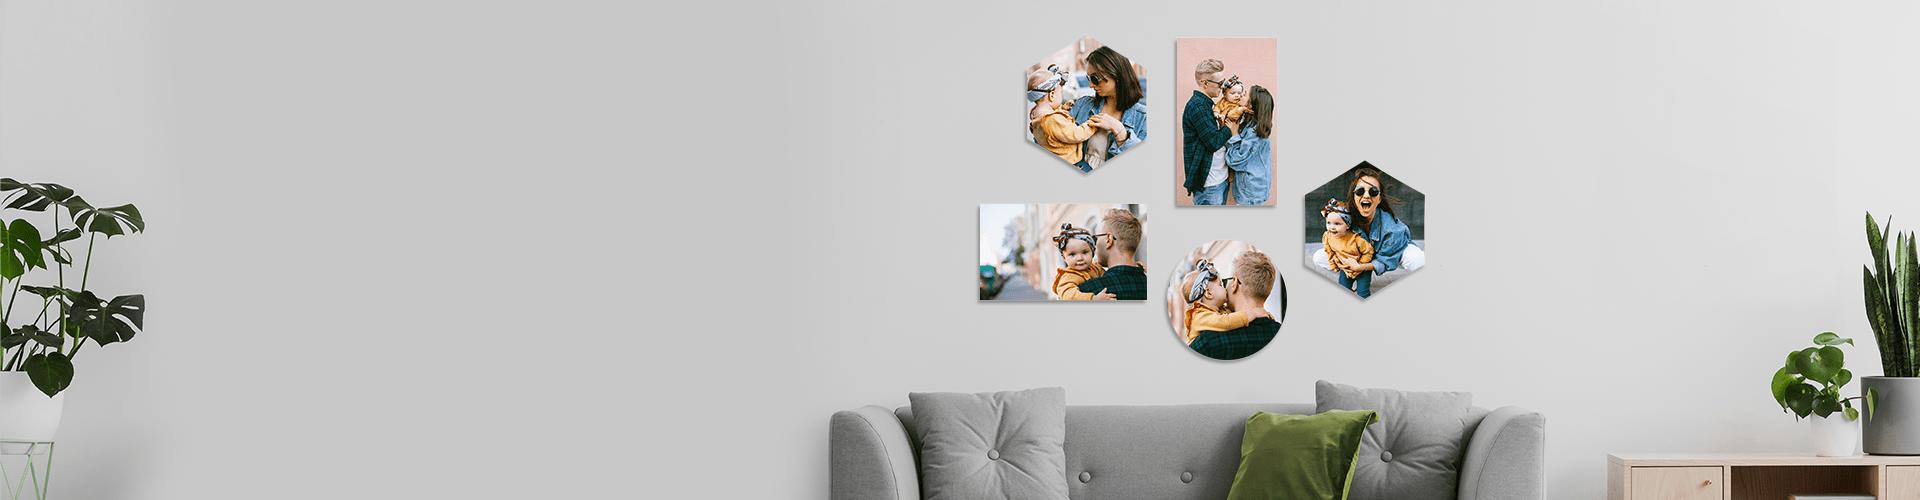 Custom Photo Wall Tiles